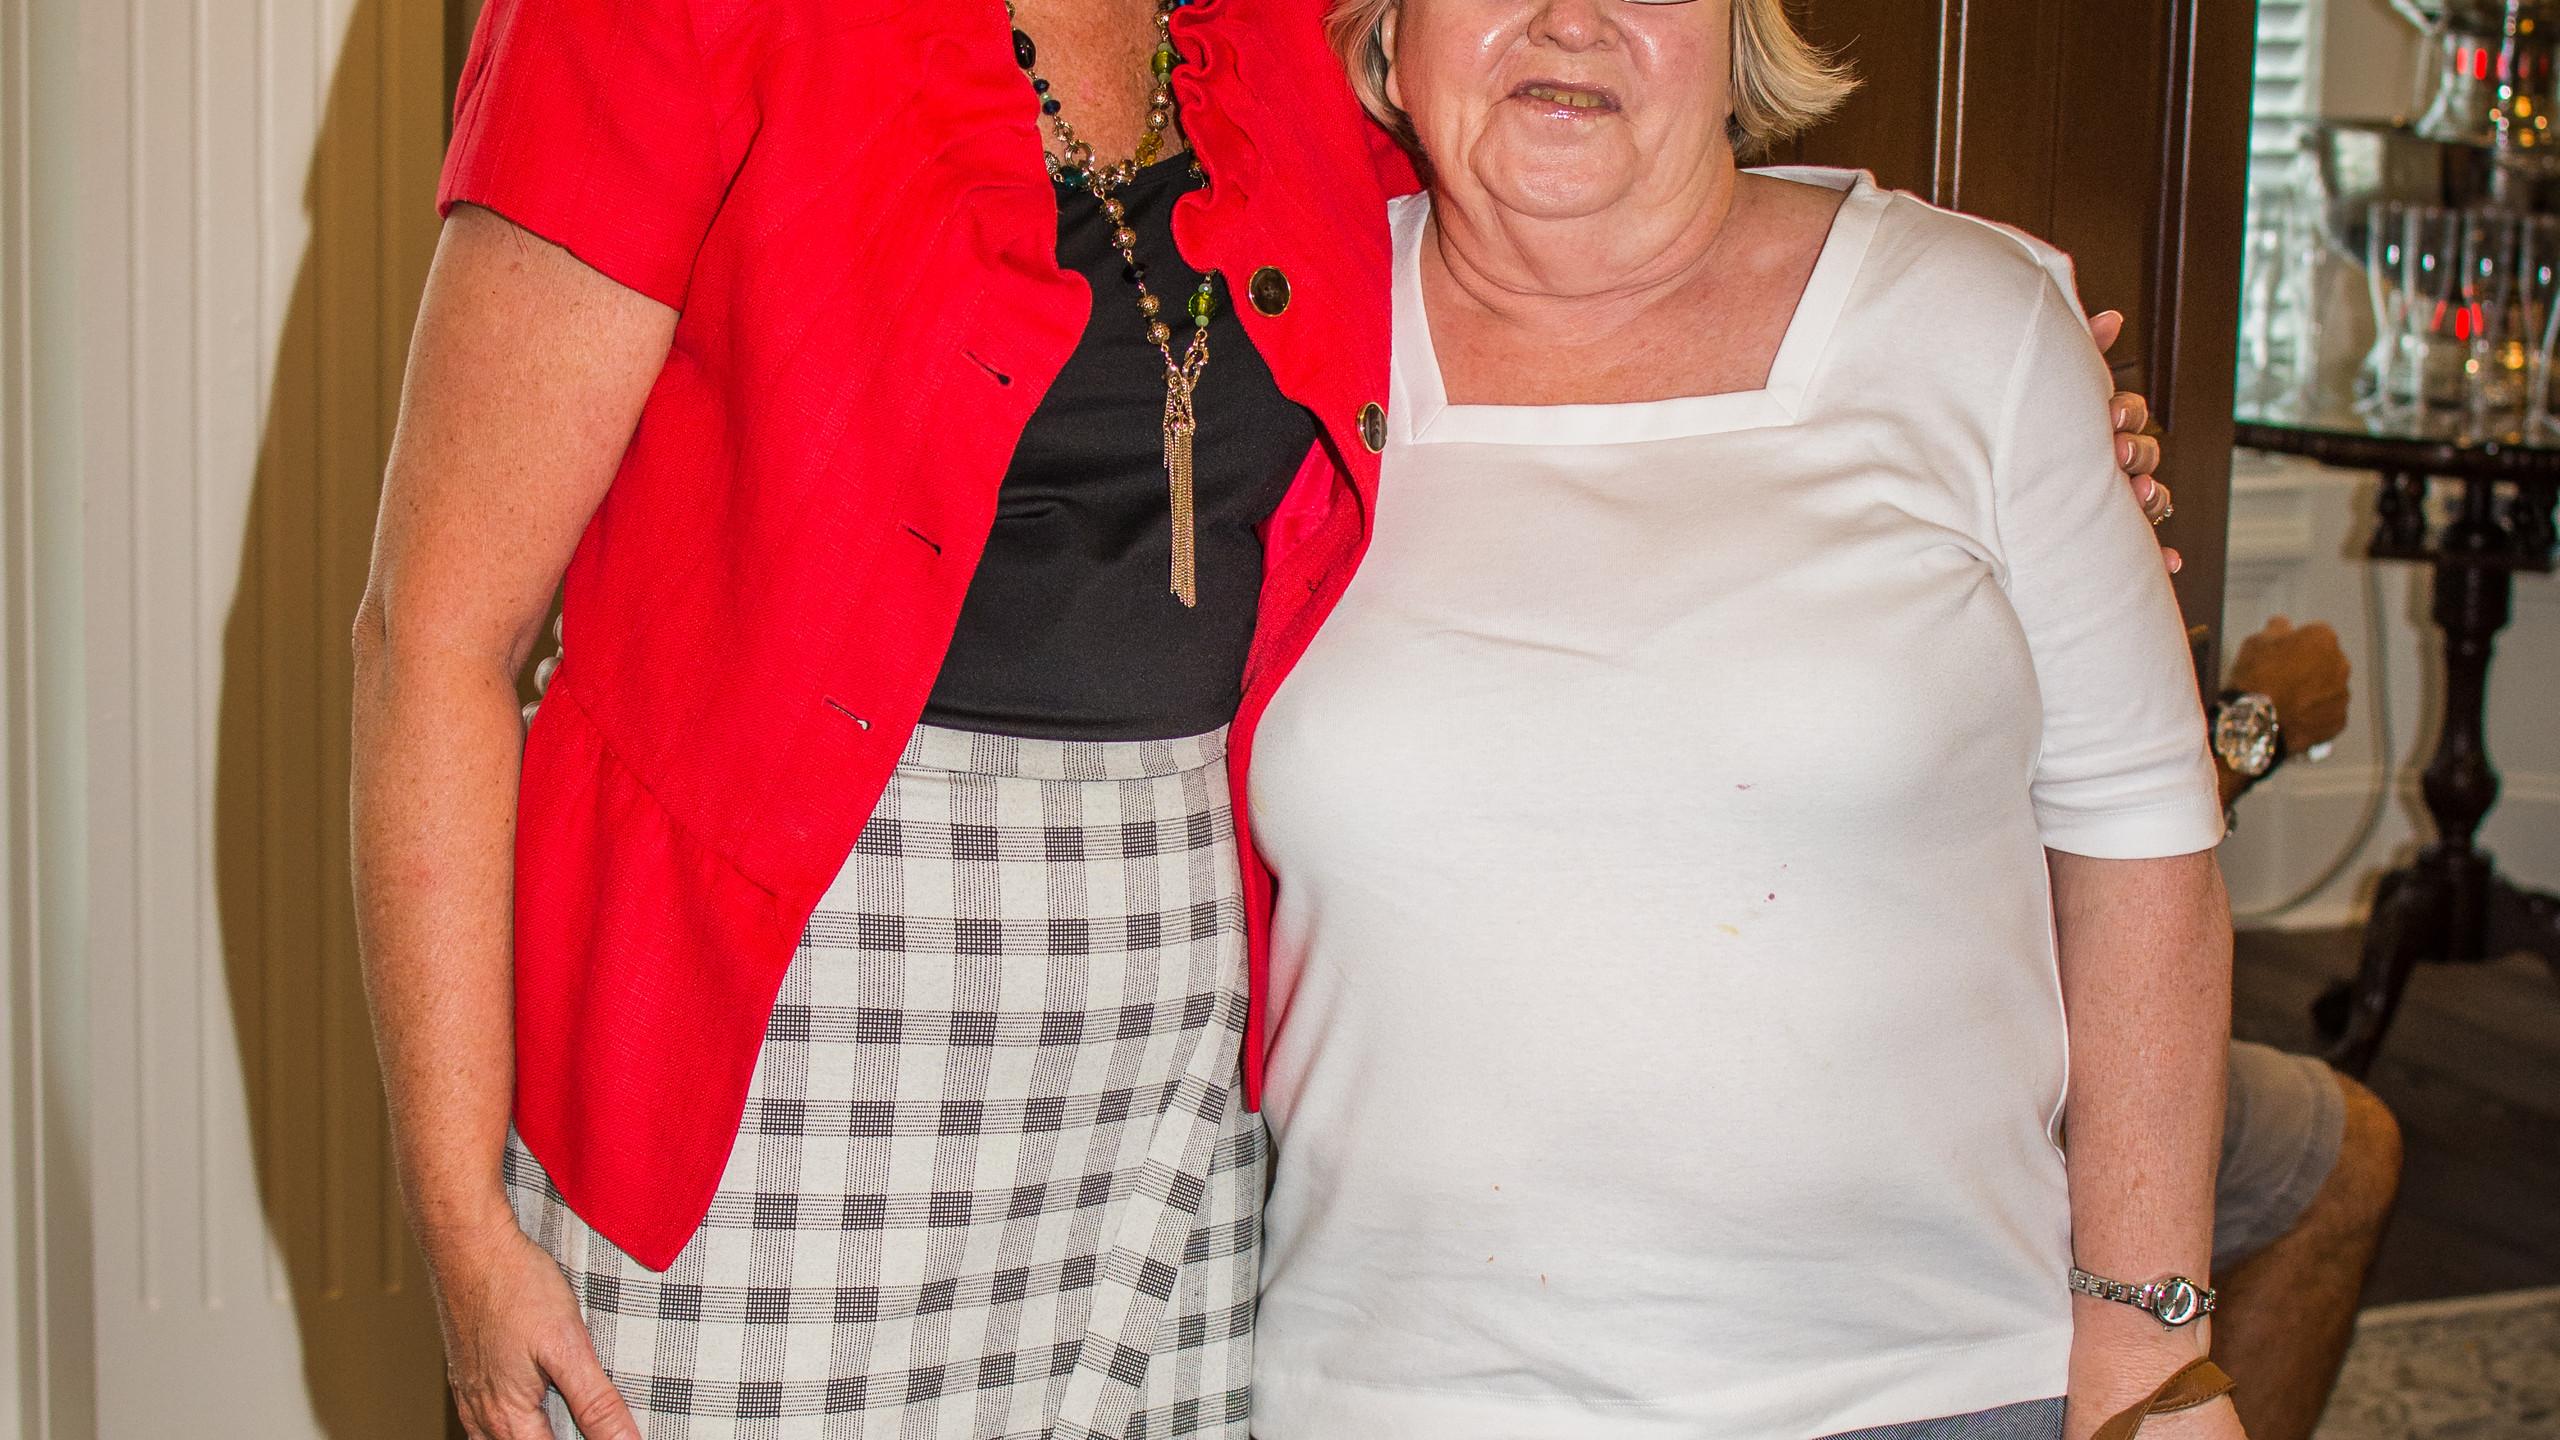 Ladonna Dowdy and Linda William